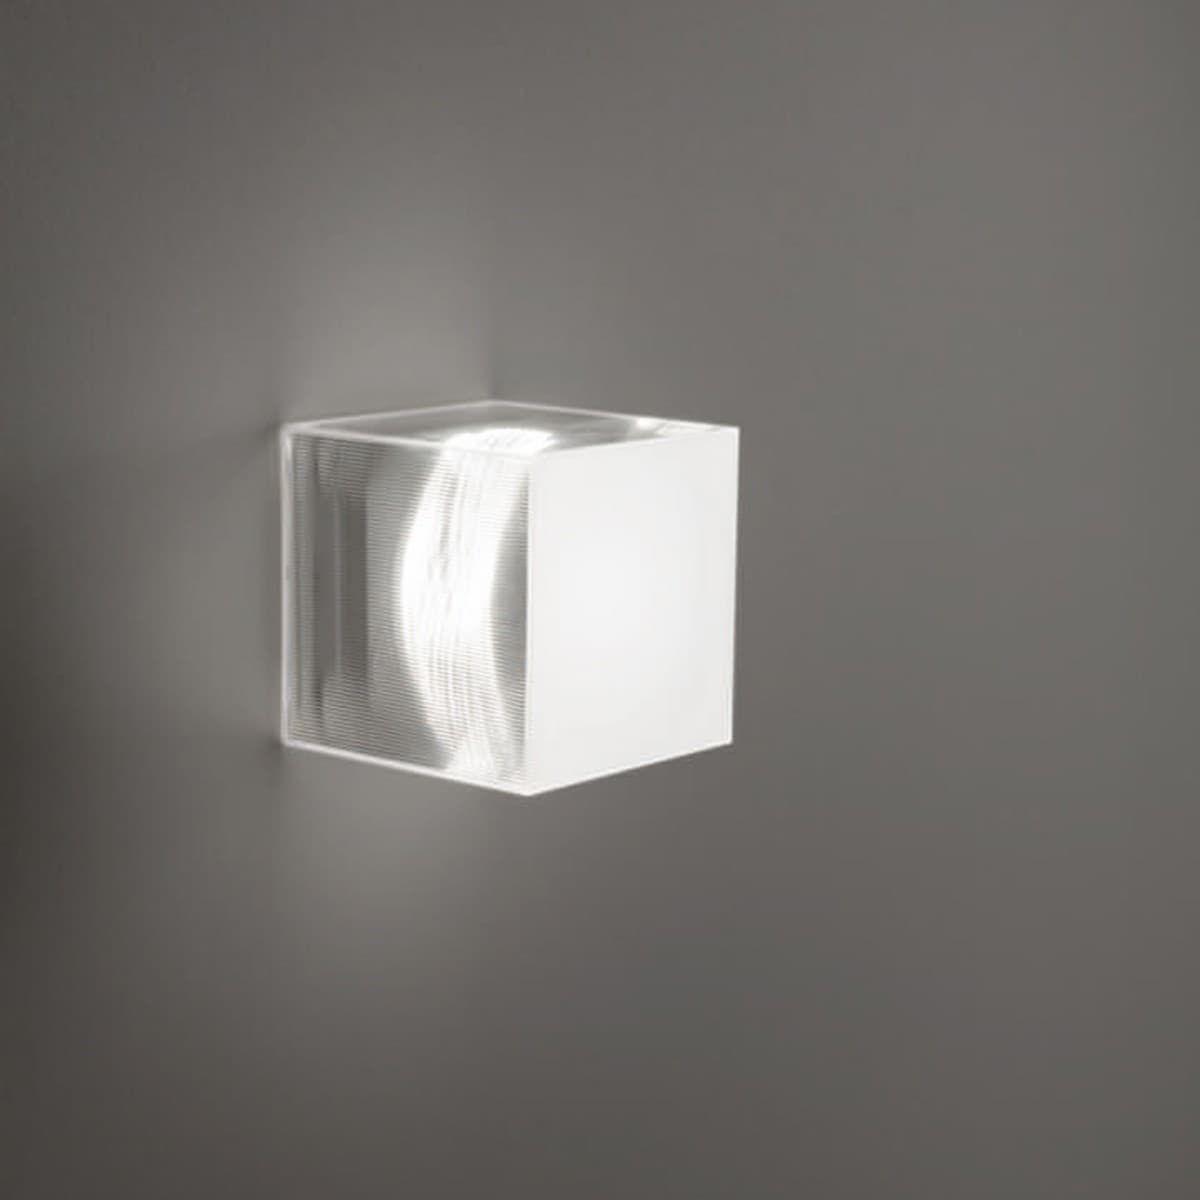 Studio Italia Design Beetle Cube Wand Deckenleuchte Mini Weiss Transparent Badbeleuchtung Indirekte Beleuchtung Beleuchtung